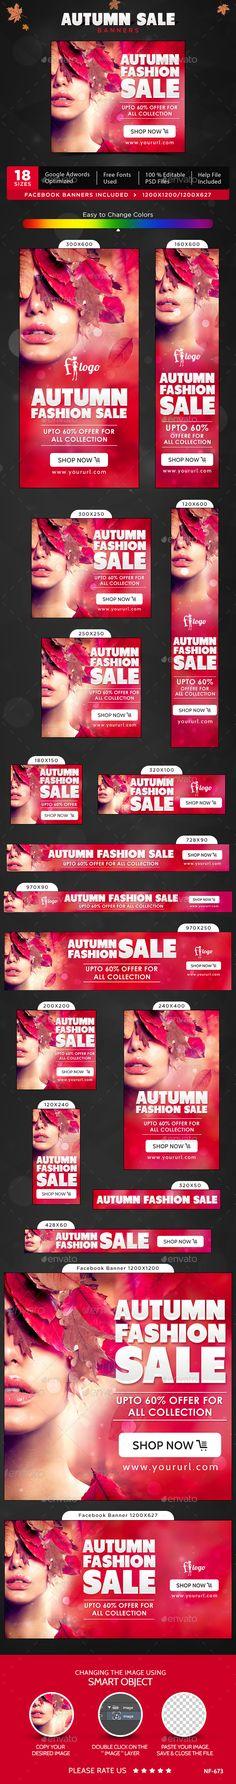 Autumn Sale Web Banners Template #design #ads Download: http://graphicriver.net/item/autumn-sale-banners/13092961?ref=ksioks